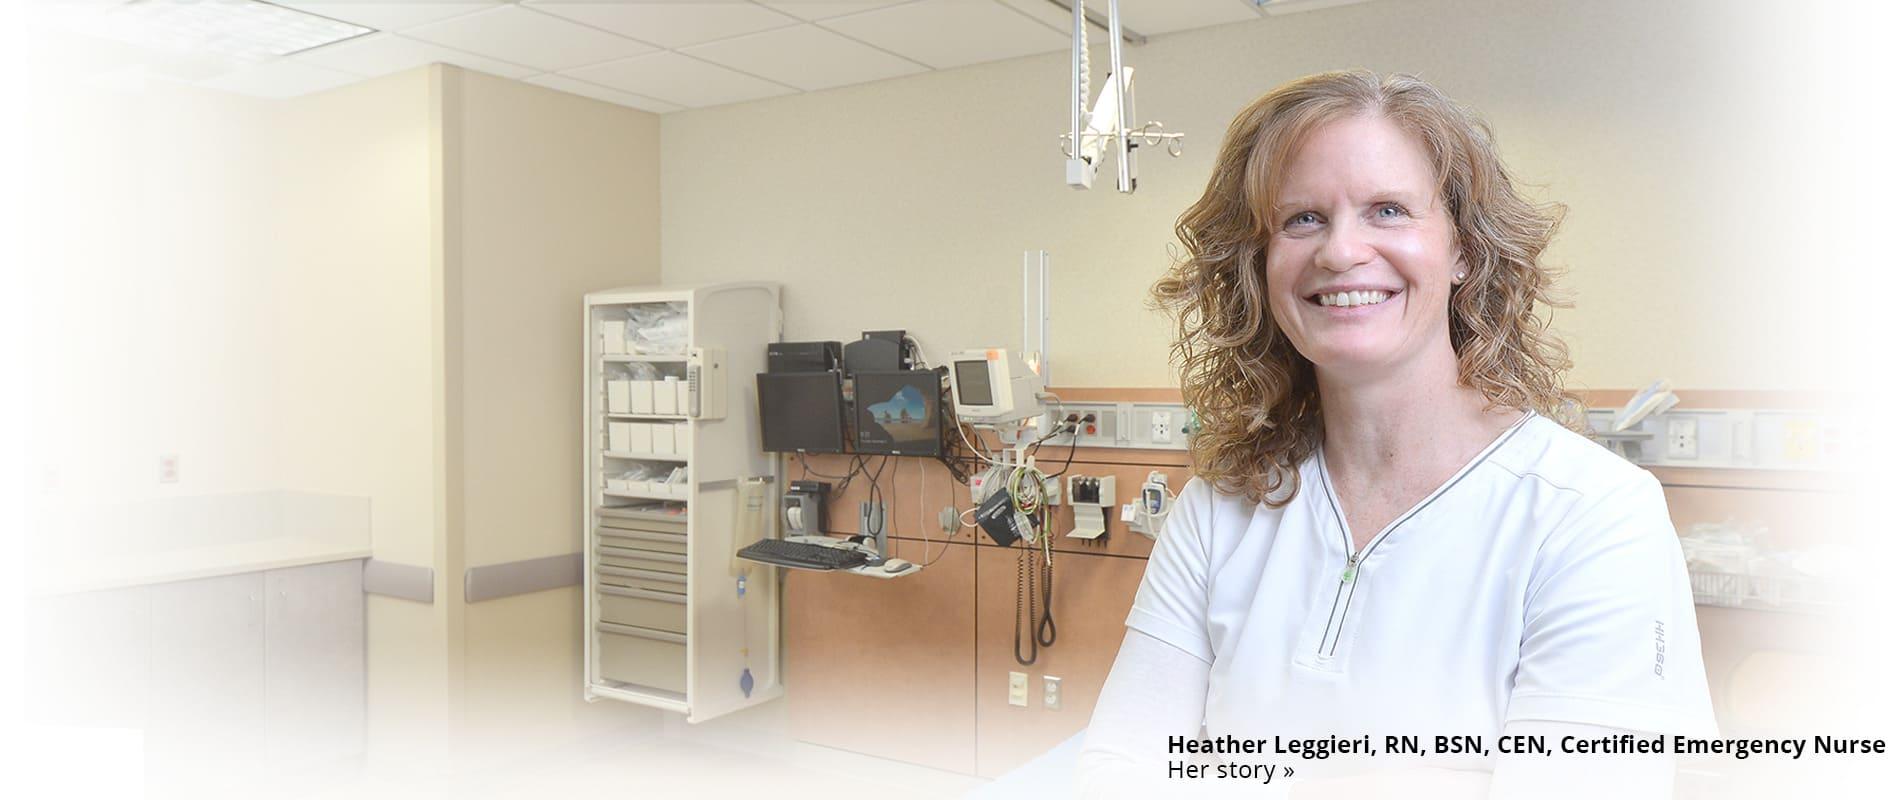 Heather Leggieri in hospital room